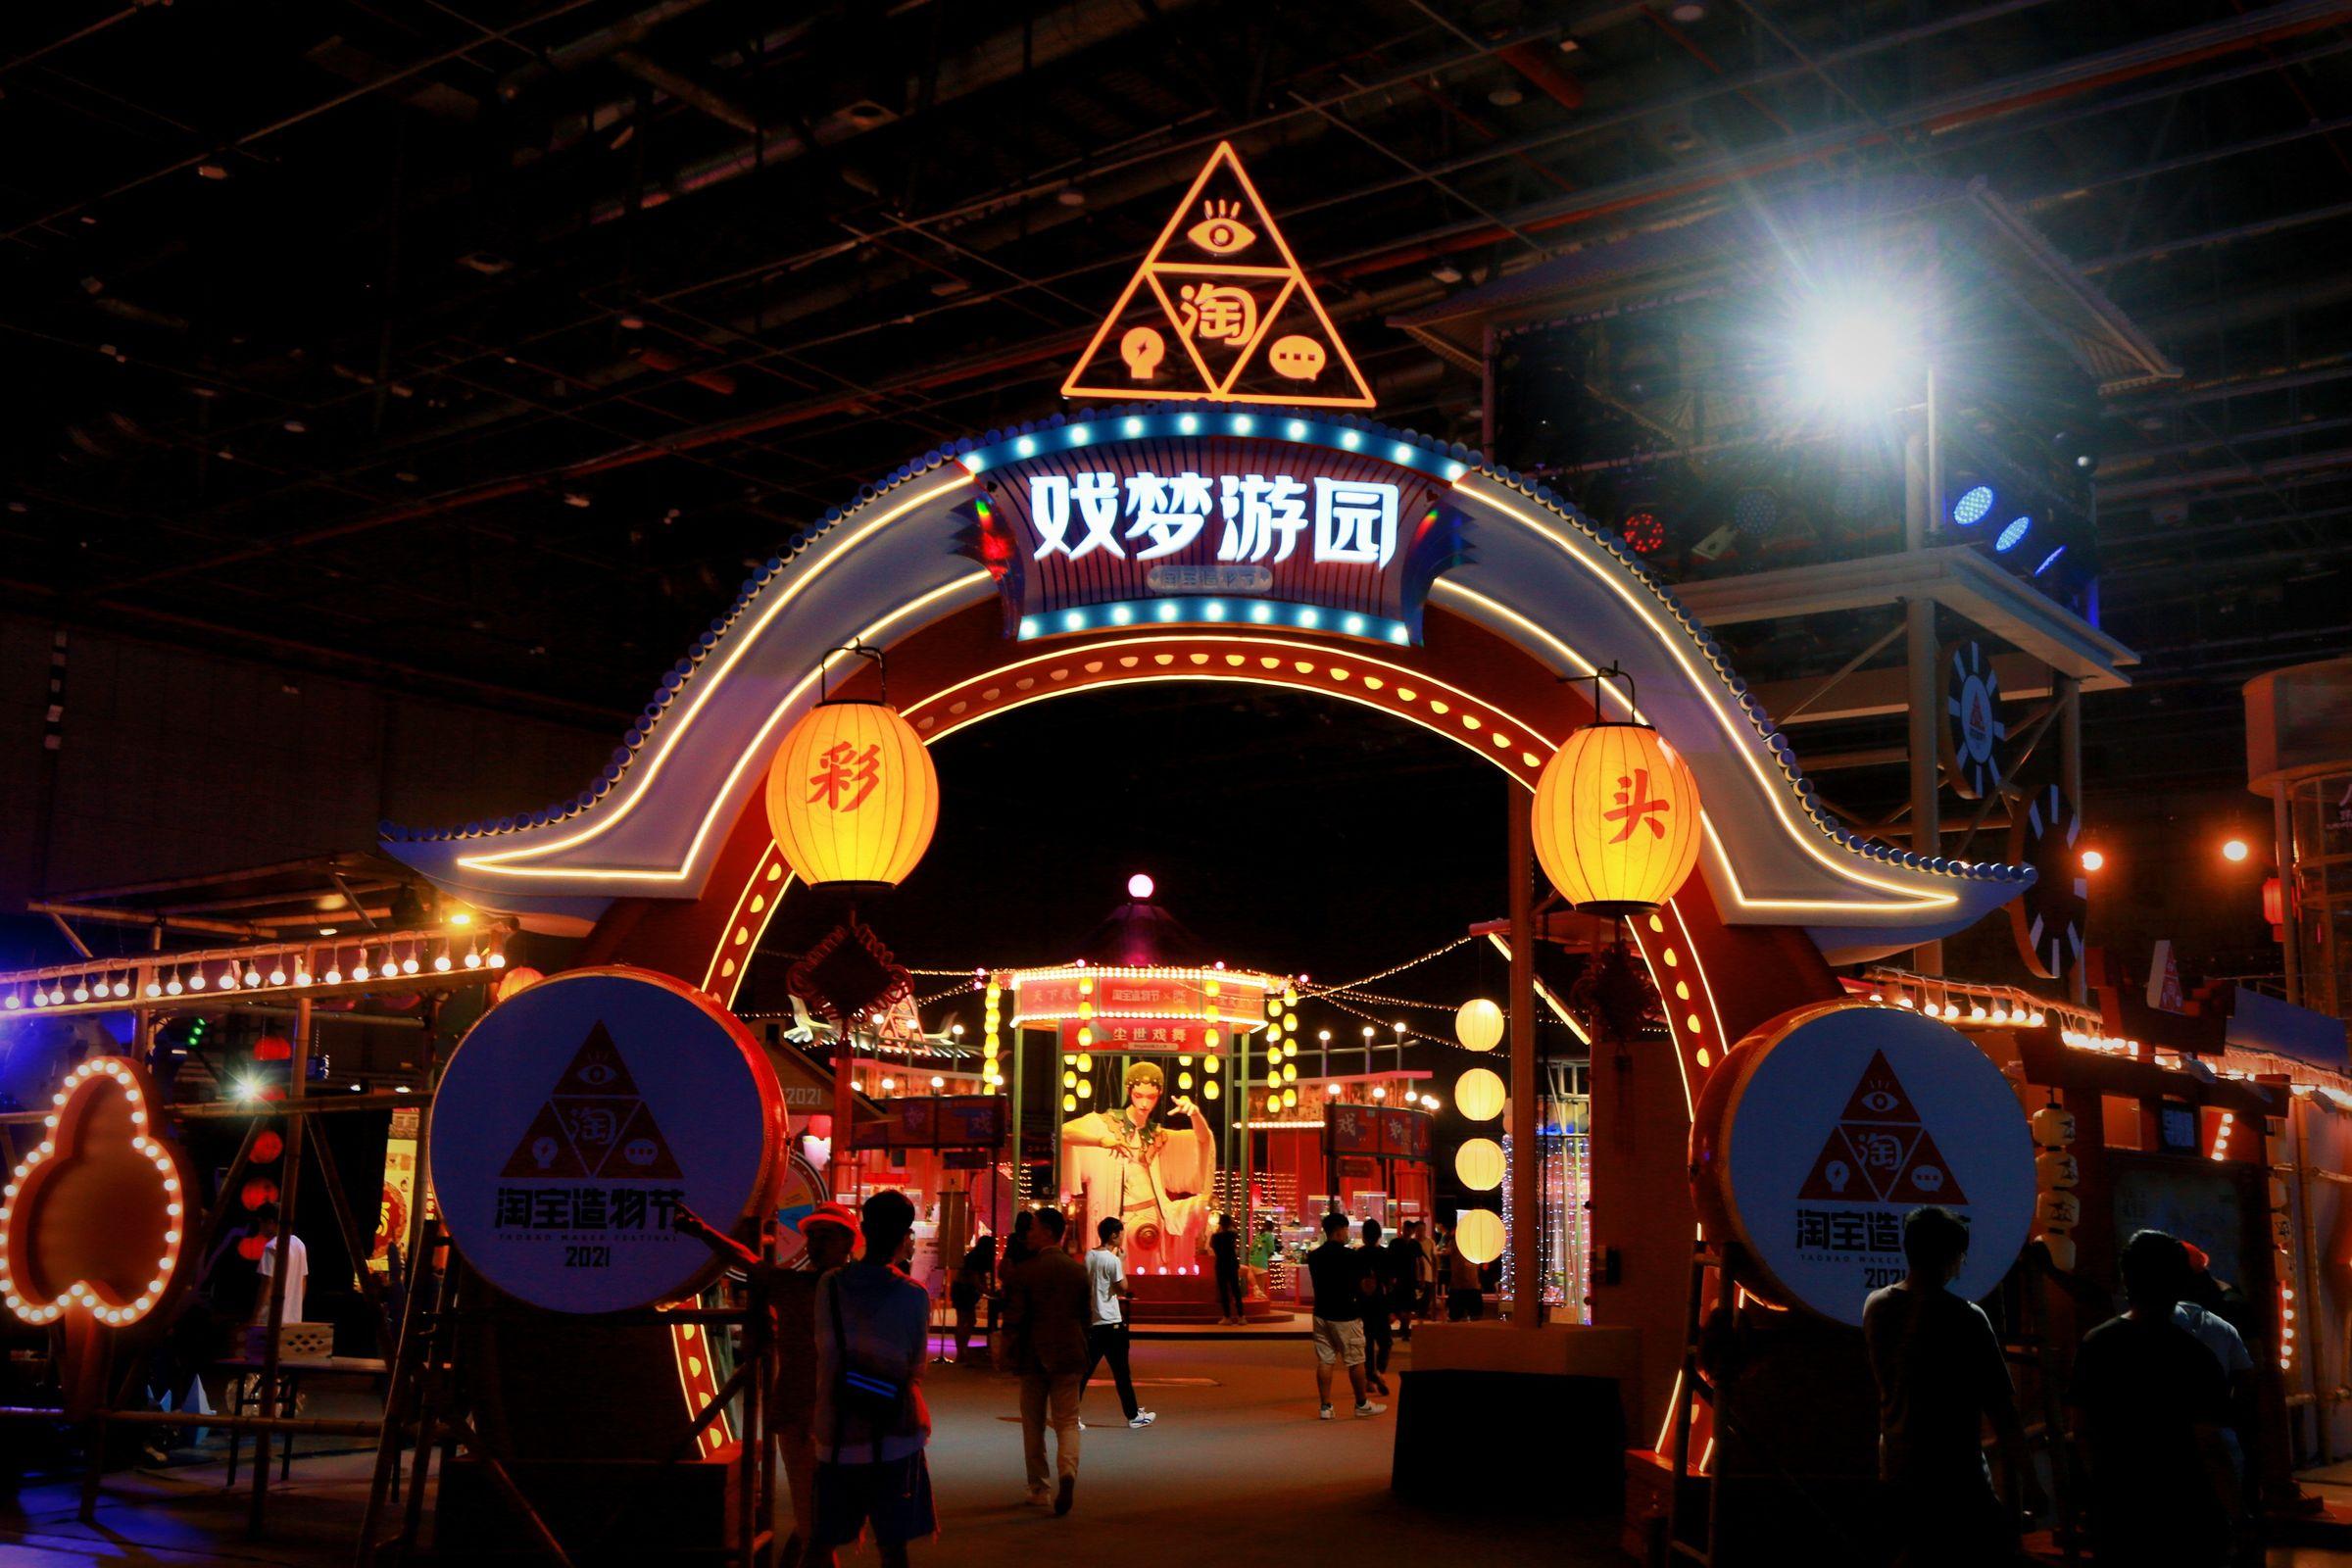 Taobao Maker Festival 2021